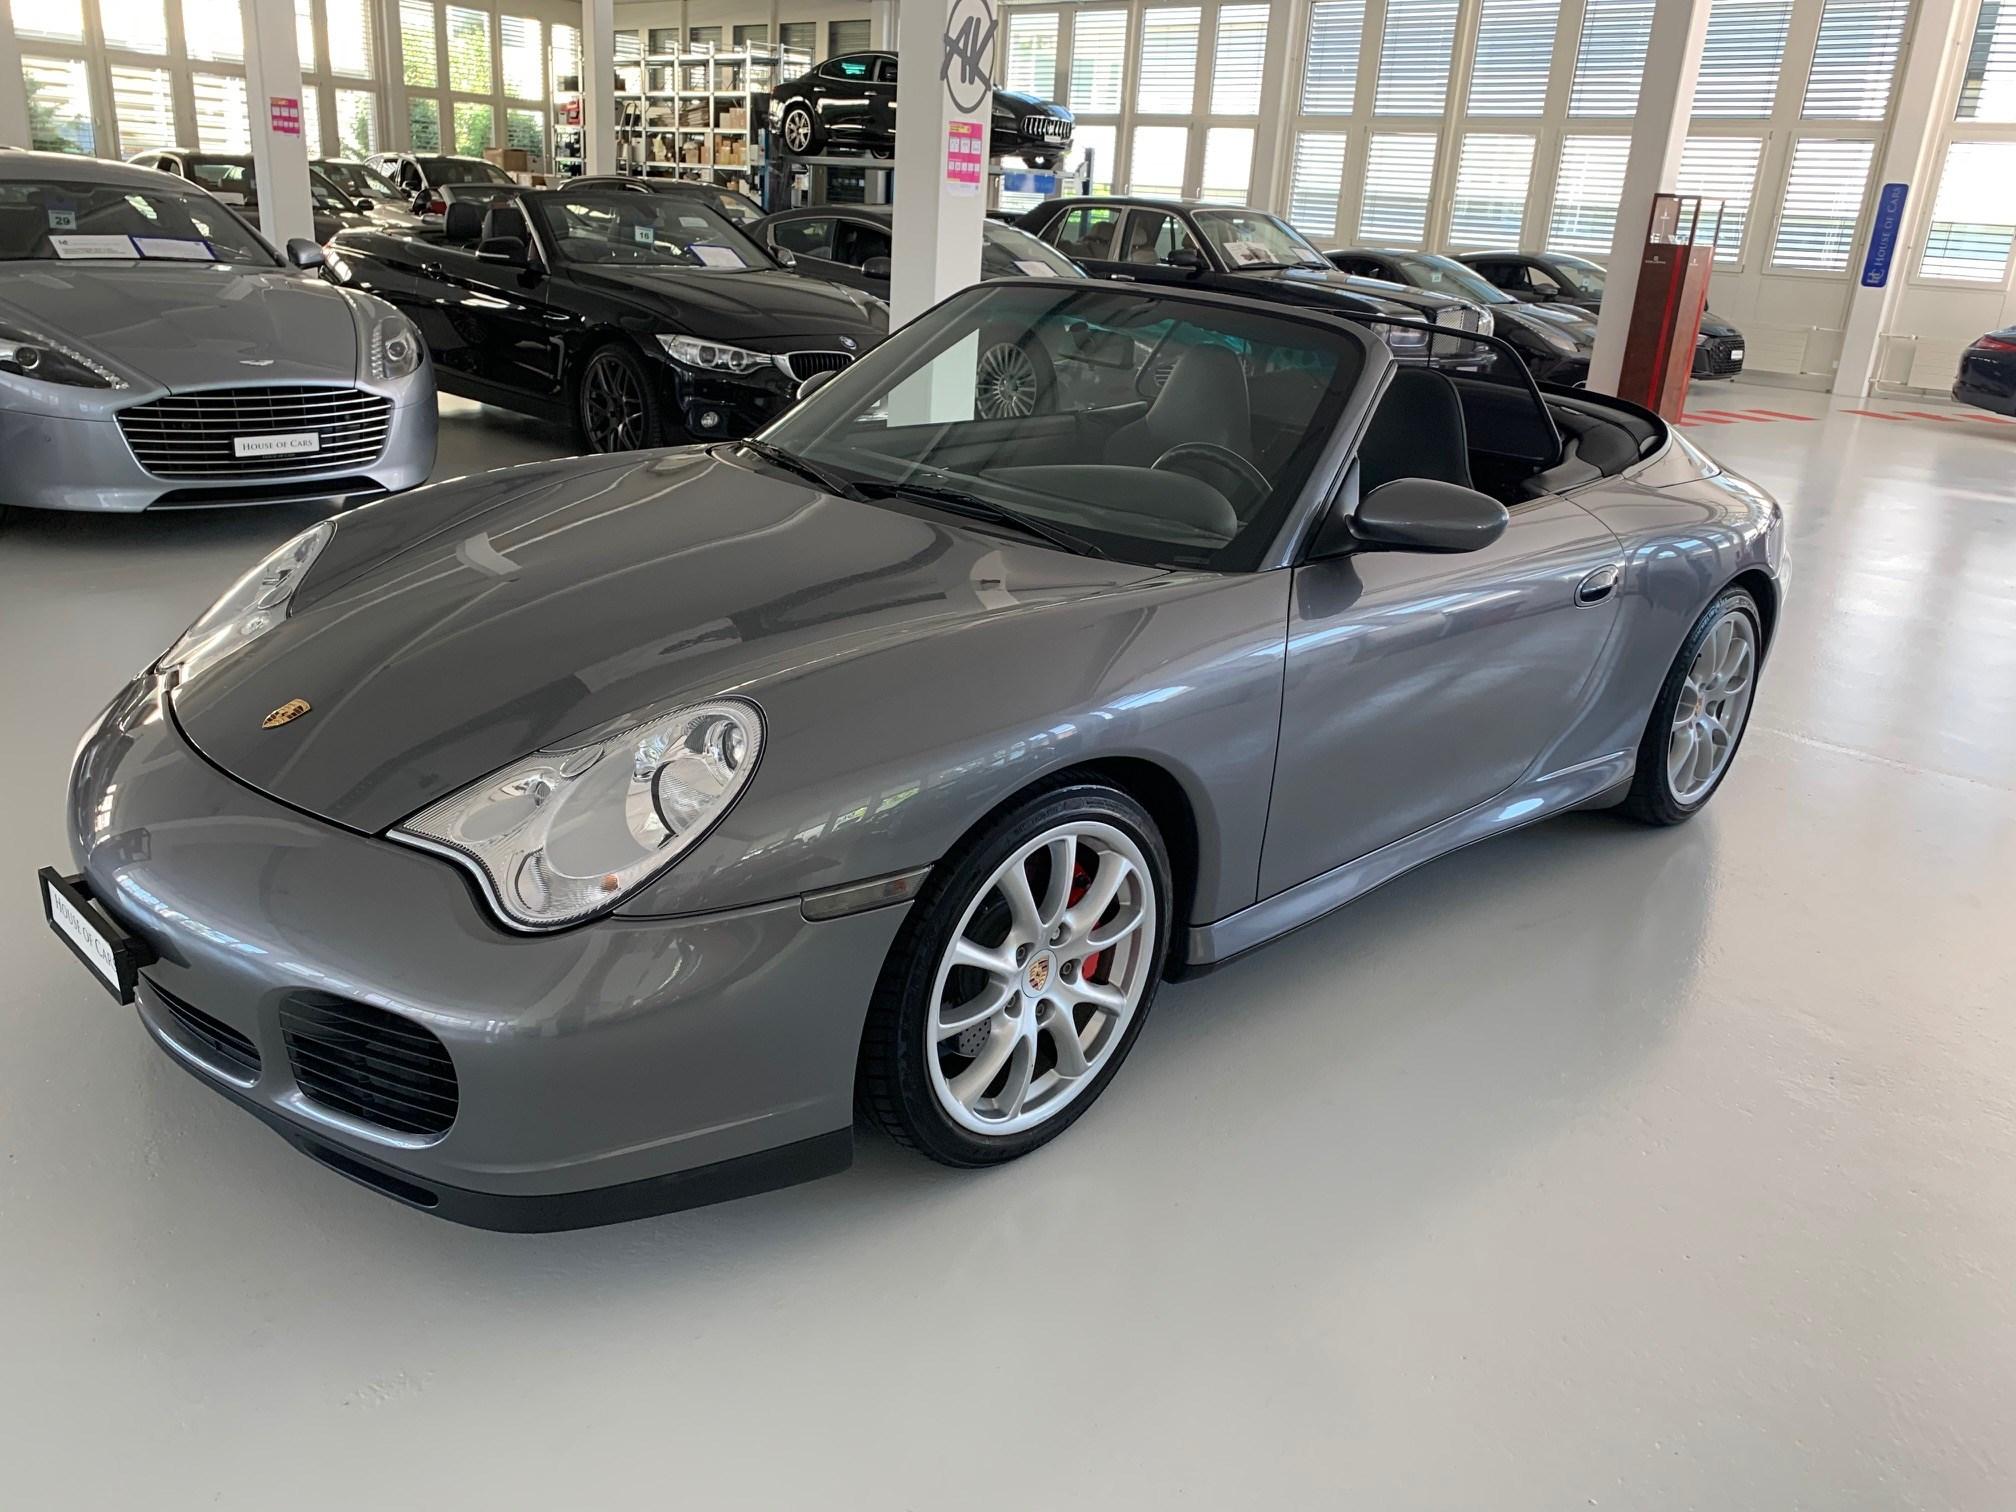 cabriolet Porsche 911 Carrera 4 S Plus Cabrio X51 (996)